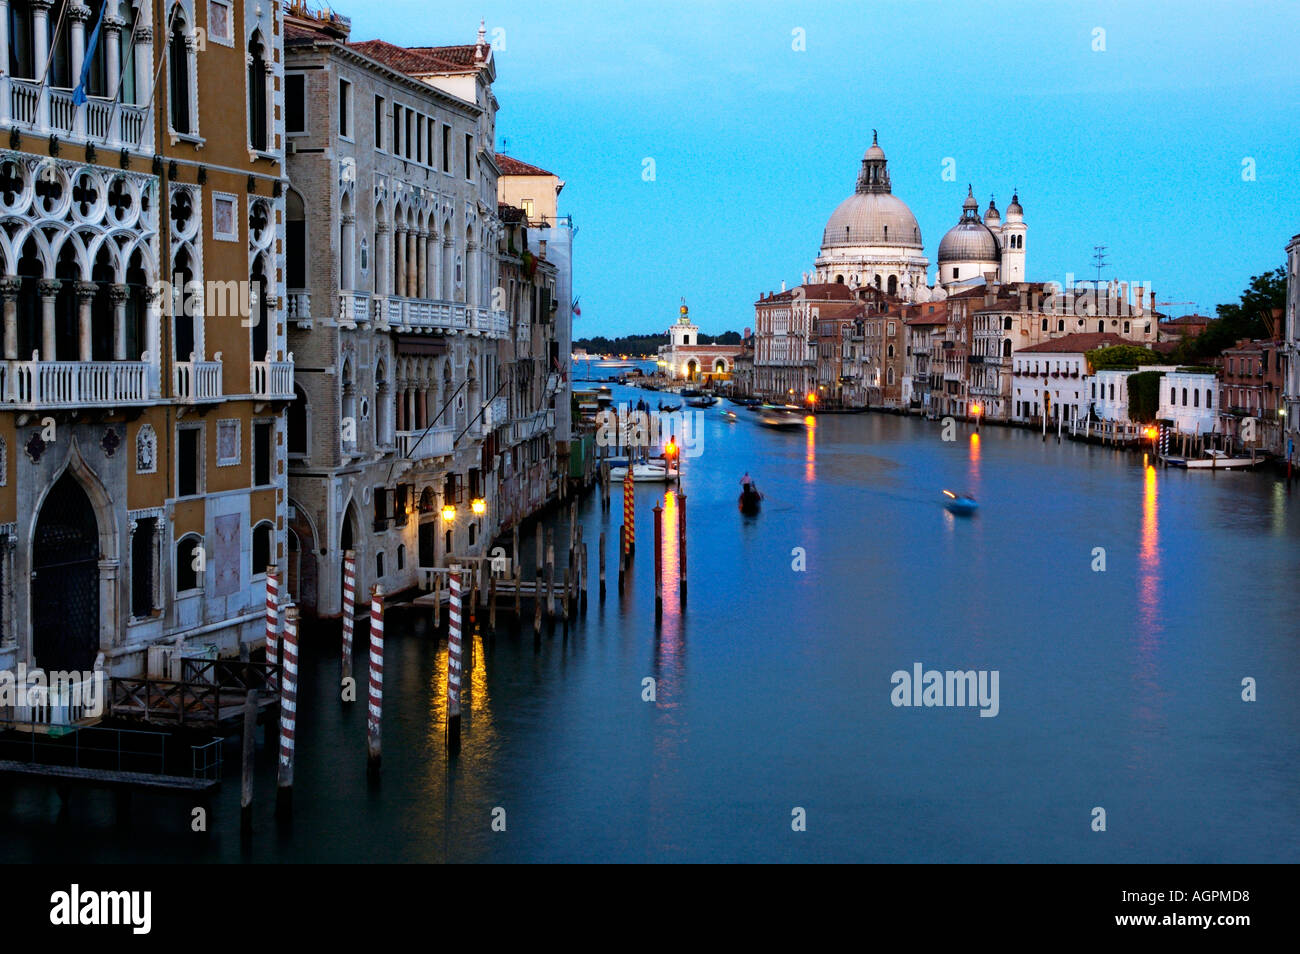 Canal grande from Accademia bridge Venice - Stock Image